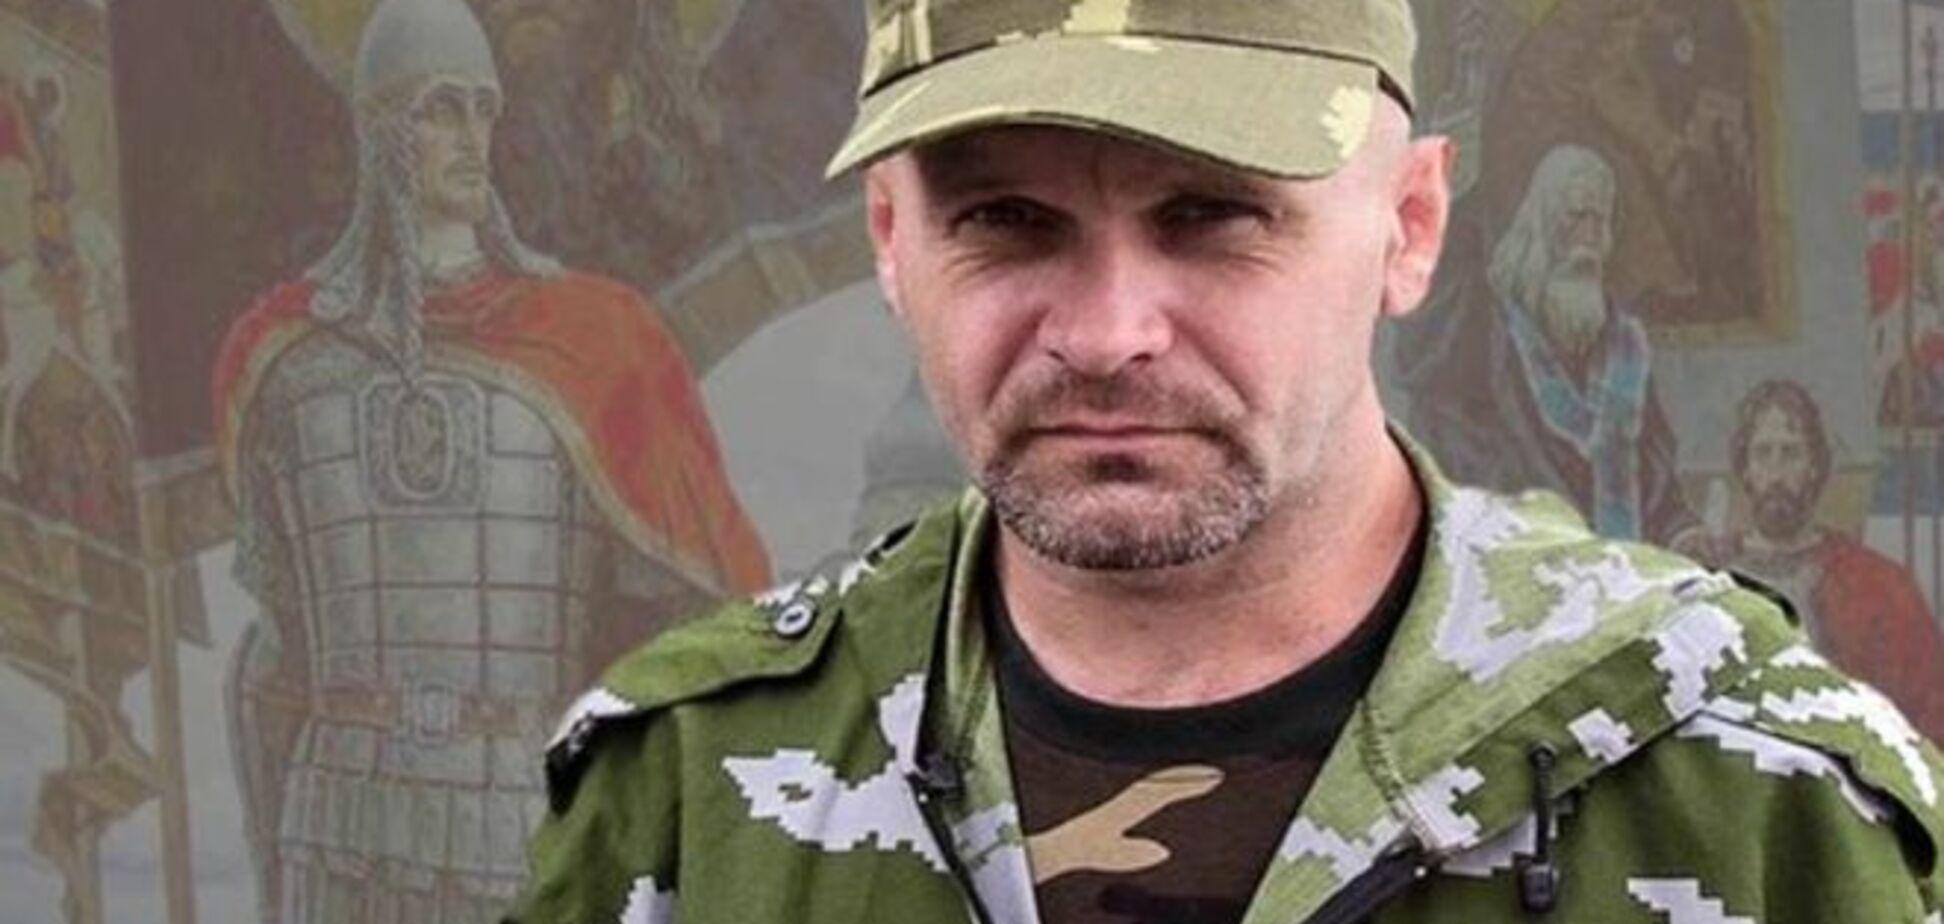 Комбрига 'Призрака' Мозгового подорвали в Алчевске